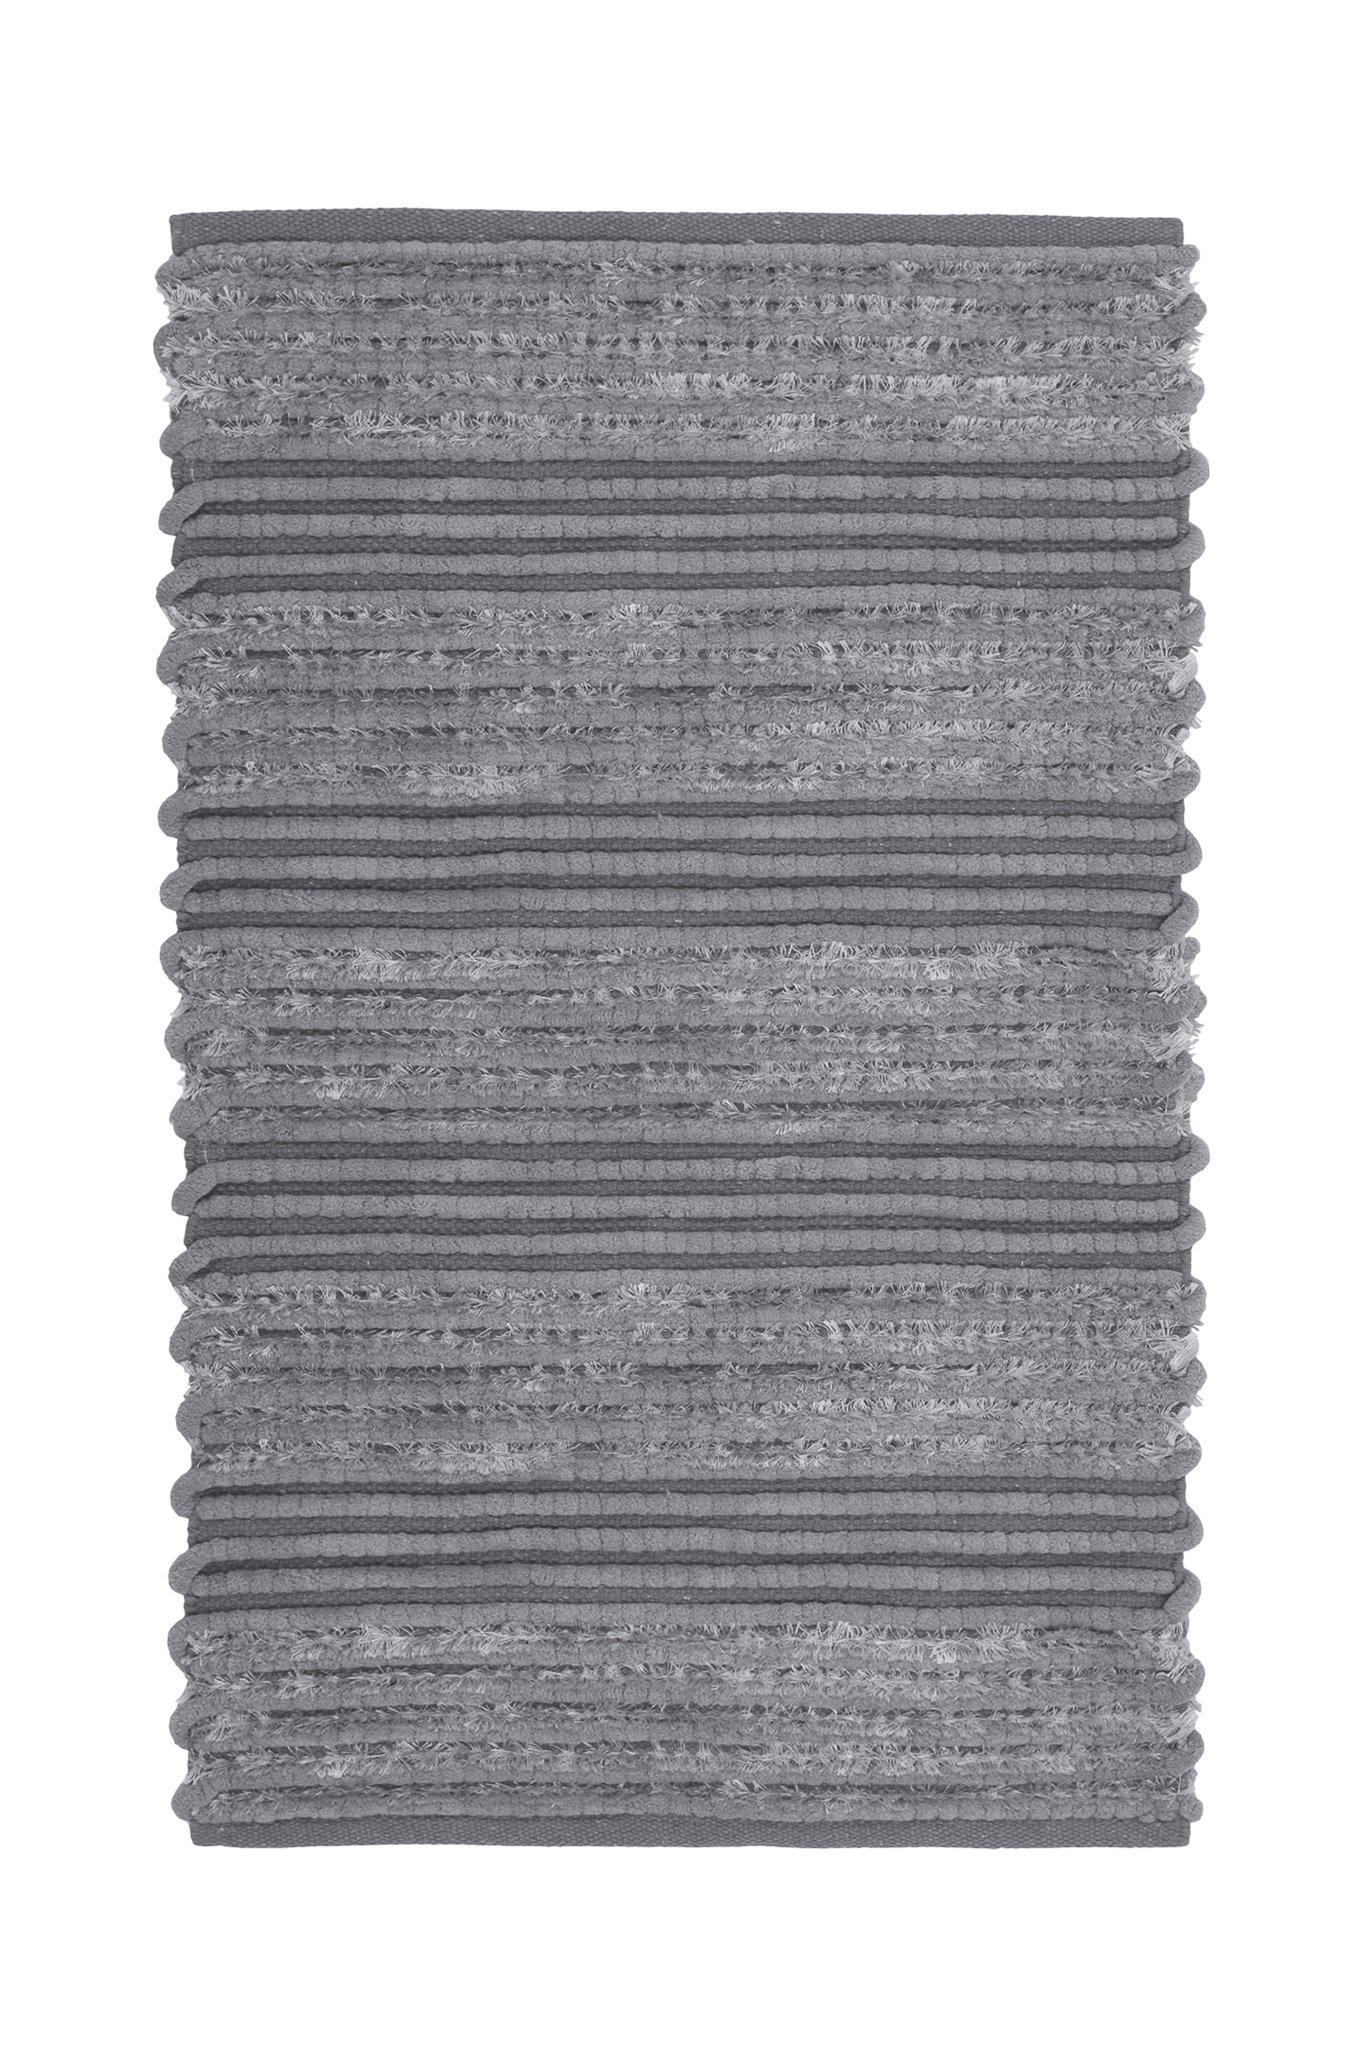 Solange Badematte 70x120 Antracite